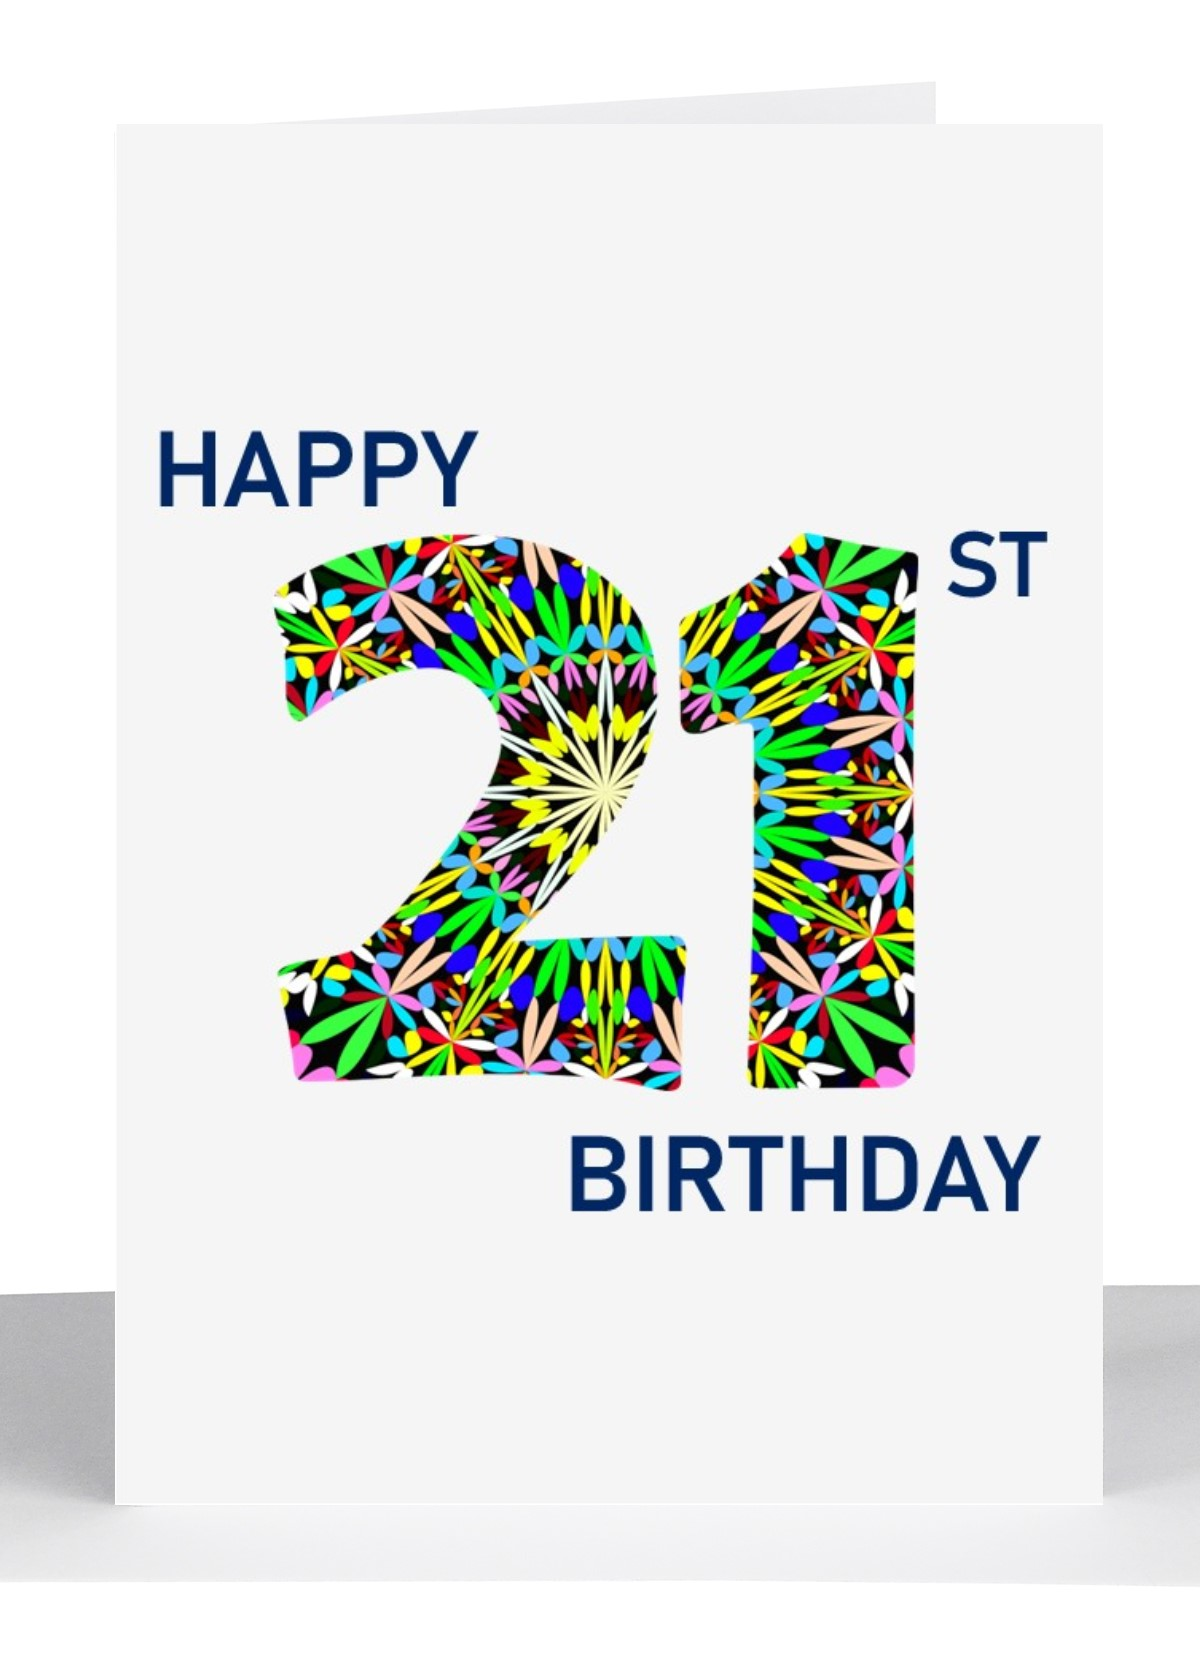 21st Birthday Card Australian Made Lils Wholesale Cards Sydney